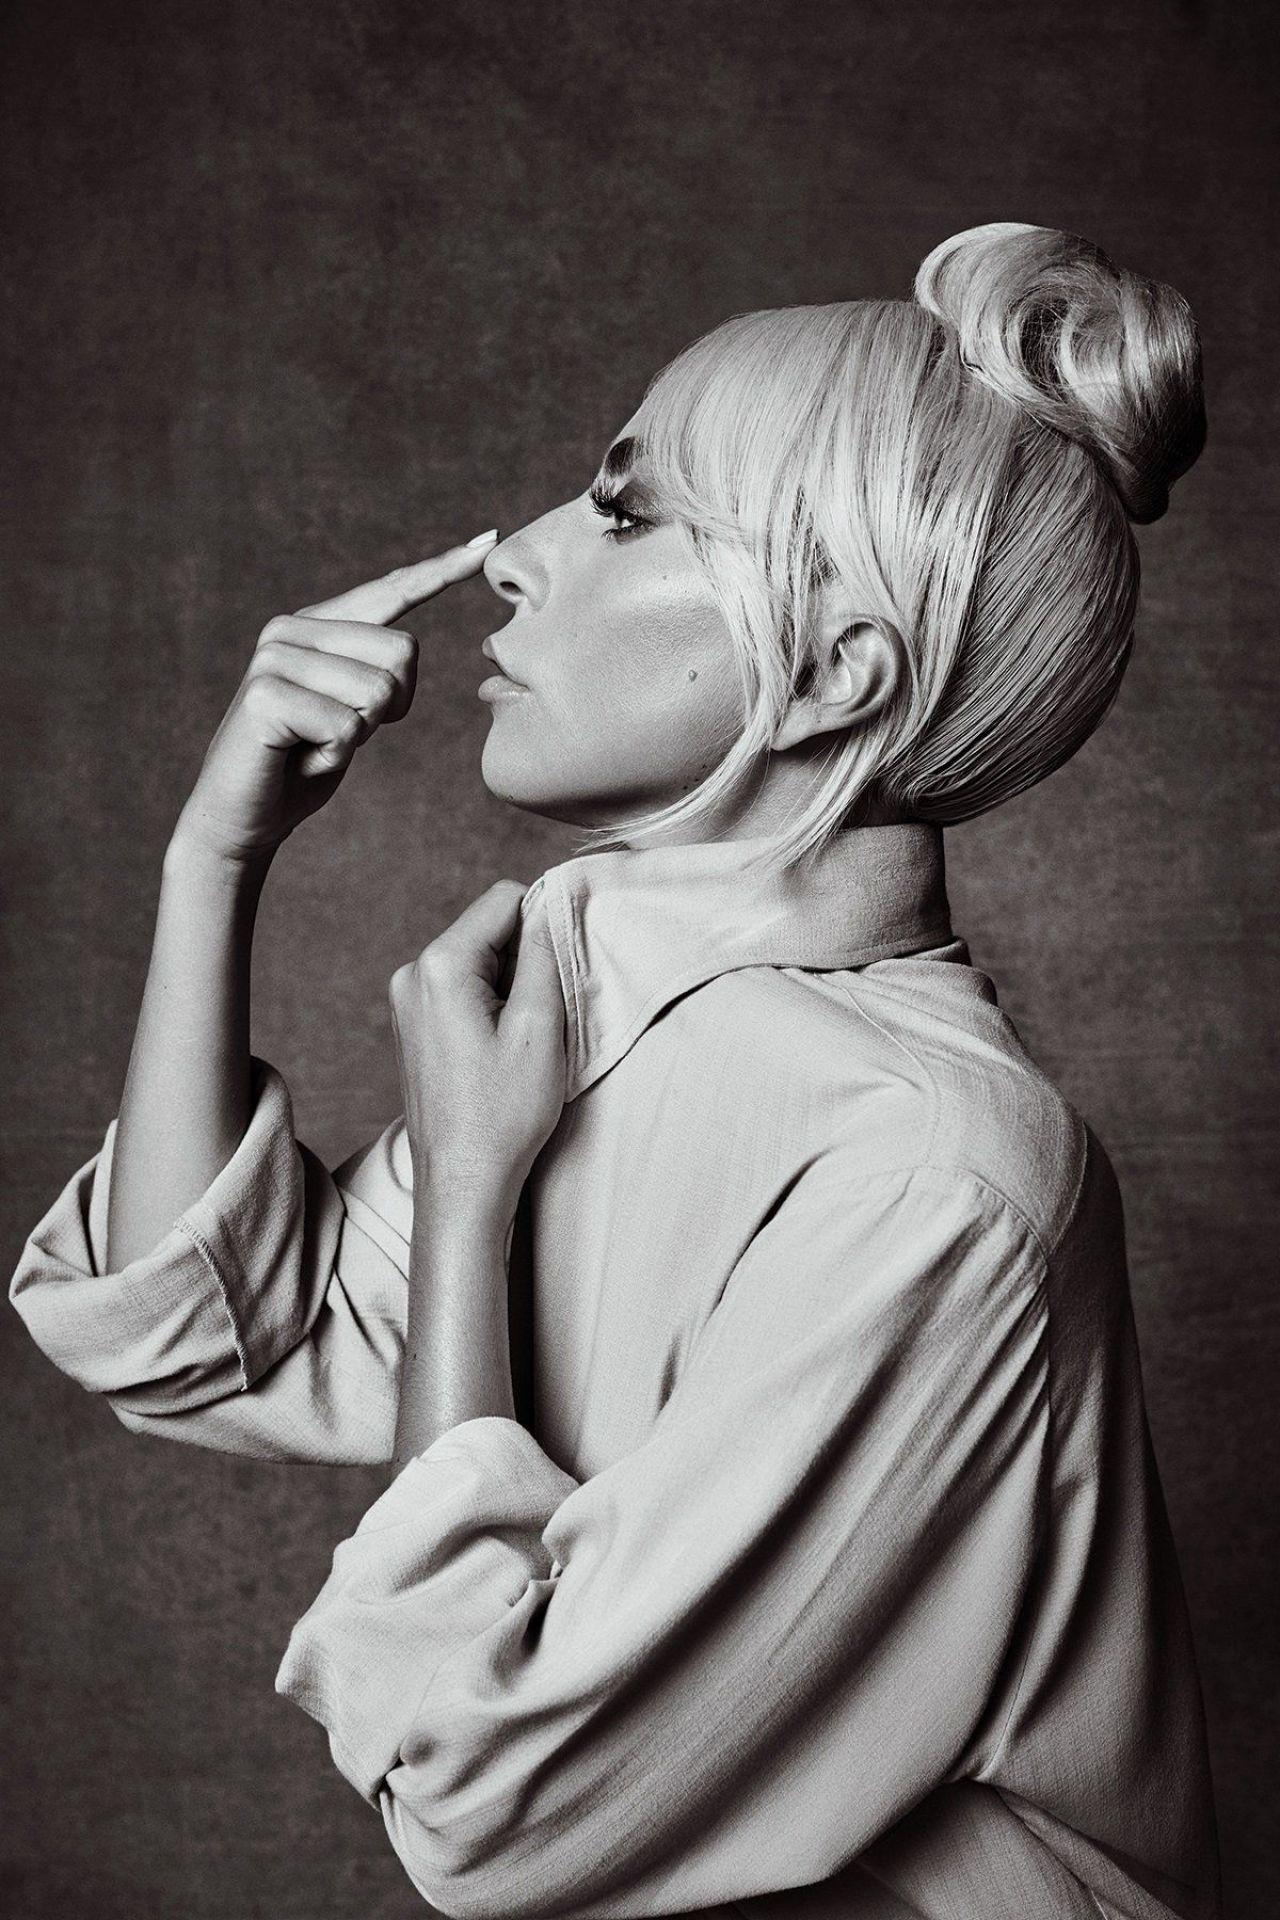 https://celebmafia.com/wp-content/uploads/2018/11/lady-gaga-variety-magazine-november-2018-5.jpg